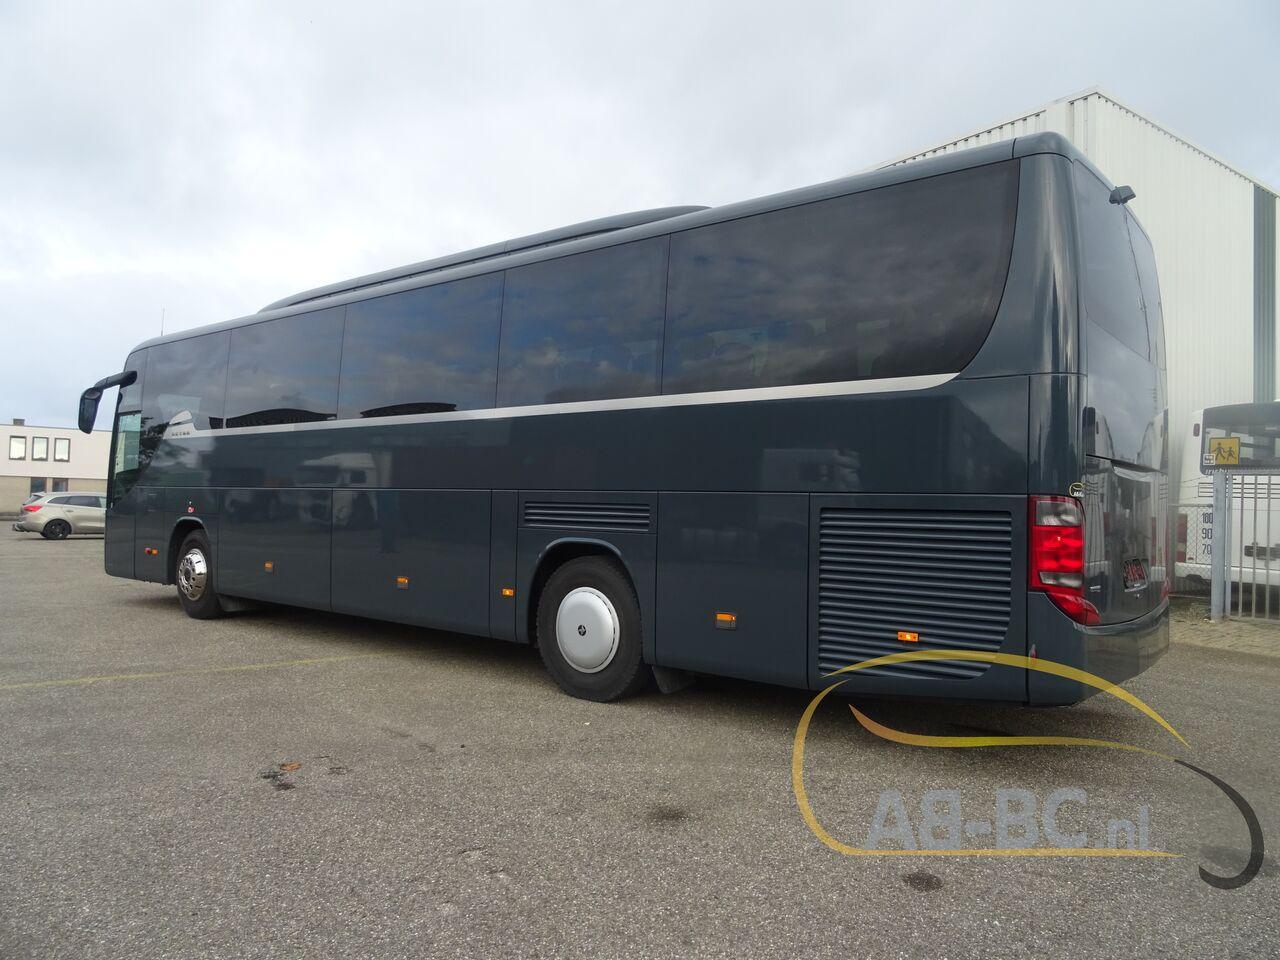 coach-busSETRA-S415-GT-HD-FINAL-EDITION---1627457018889769325_big_da56e5885f655223b842bbd27c46dec7--21050713010665719300